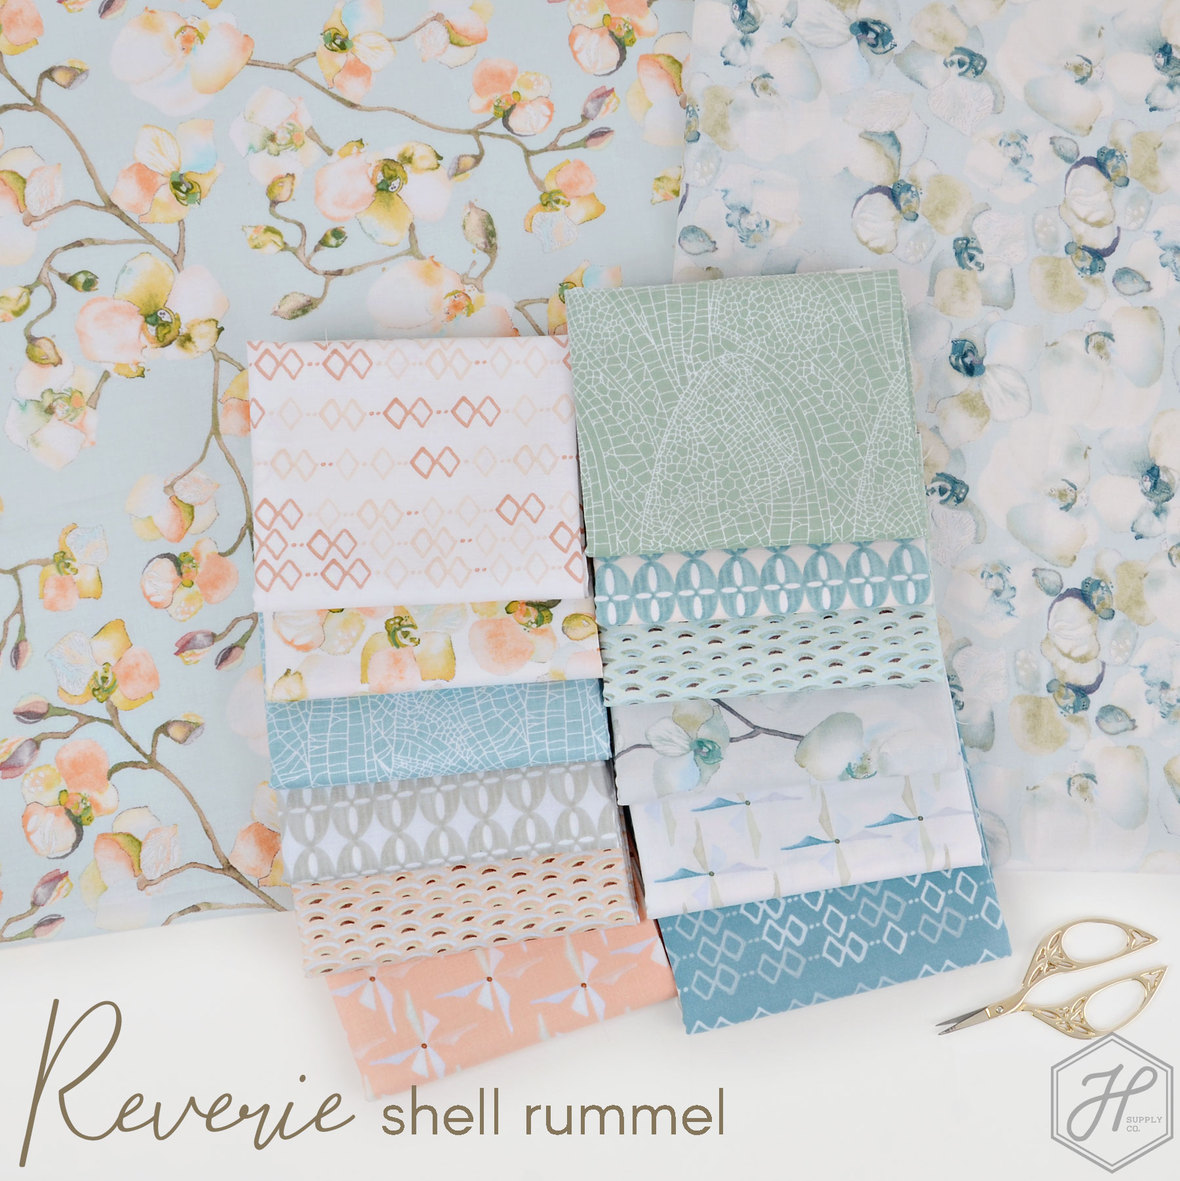 Shell-Rummel-Reverie-Fabric-Free-Spirit-at-Hawthorne-Supply-Co